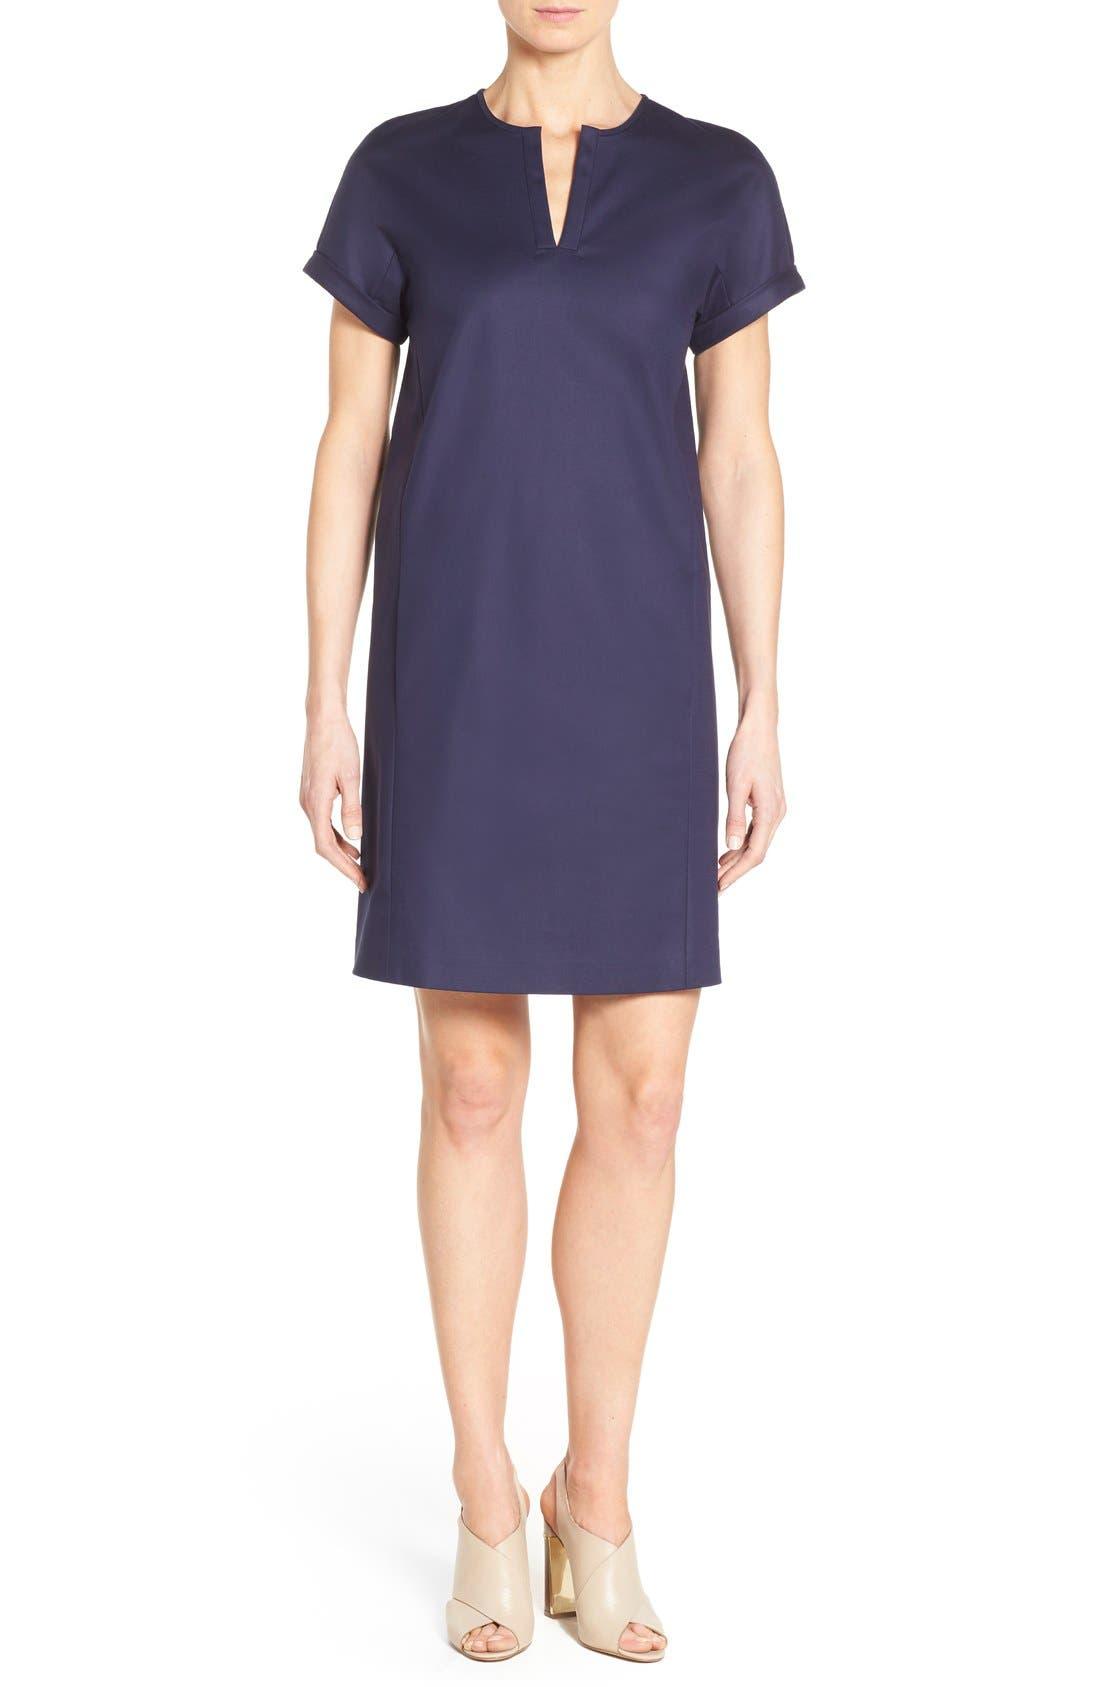 Alternate Image 1 Selected - Nordstrom Collection Stretch Poplin Shift Dress